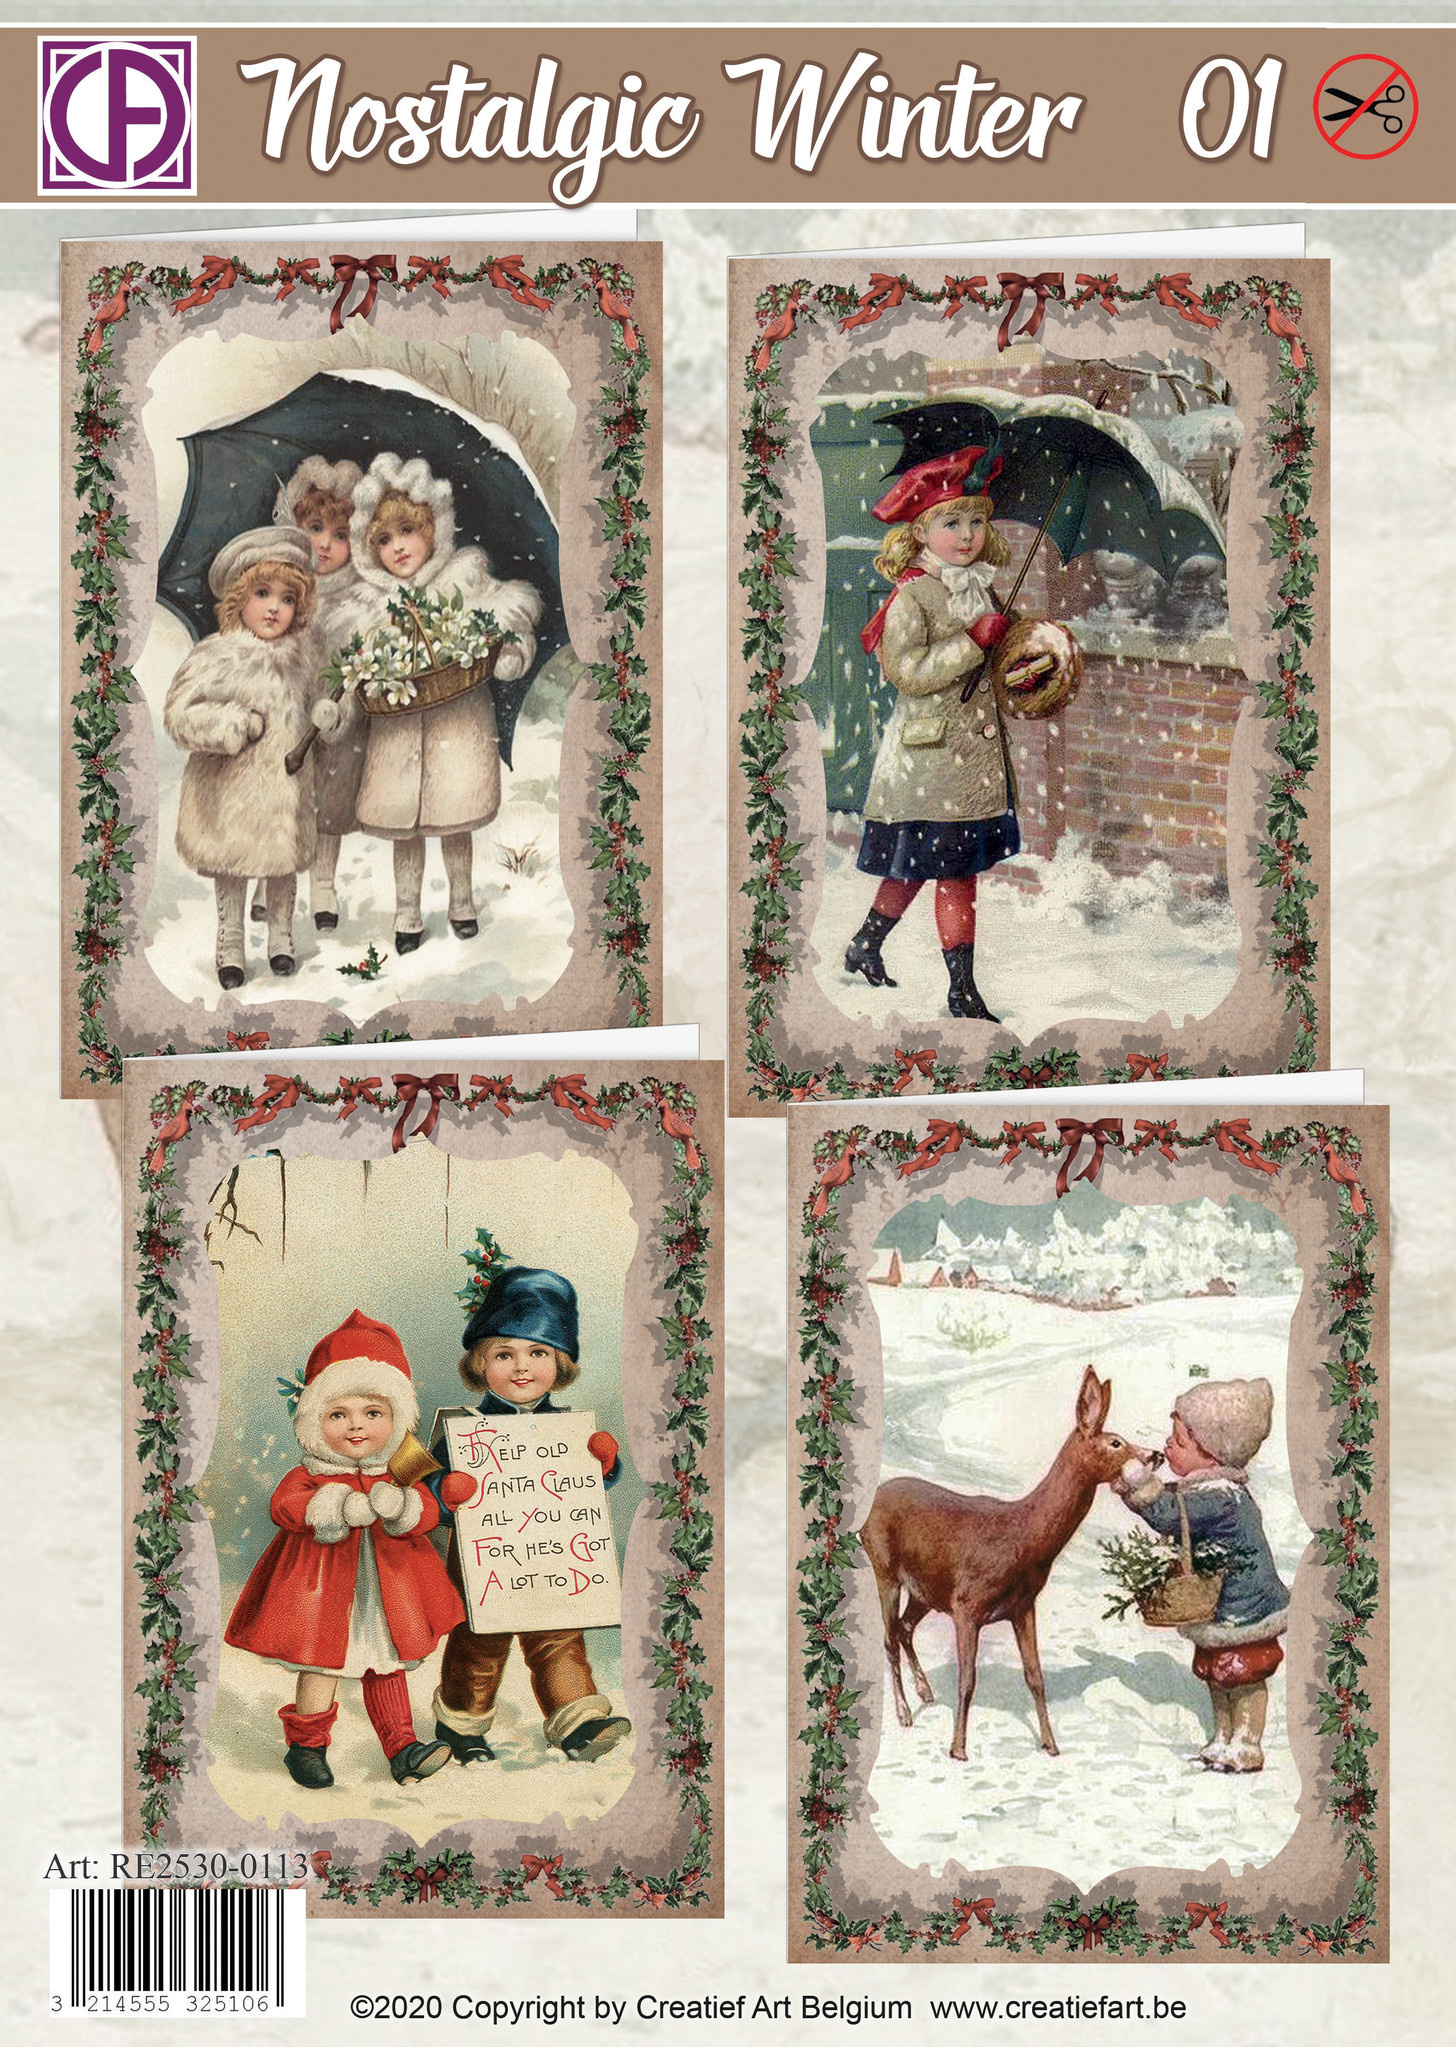 Creatief Art Nostalgic winter 01